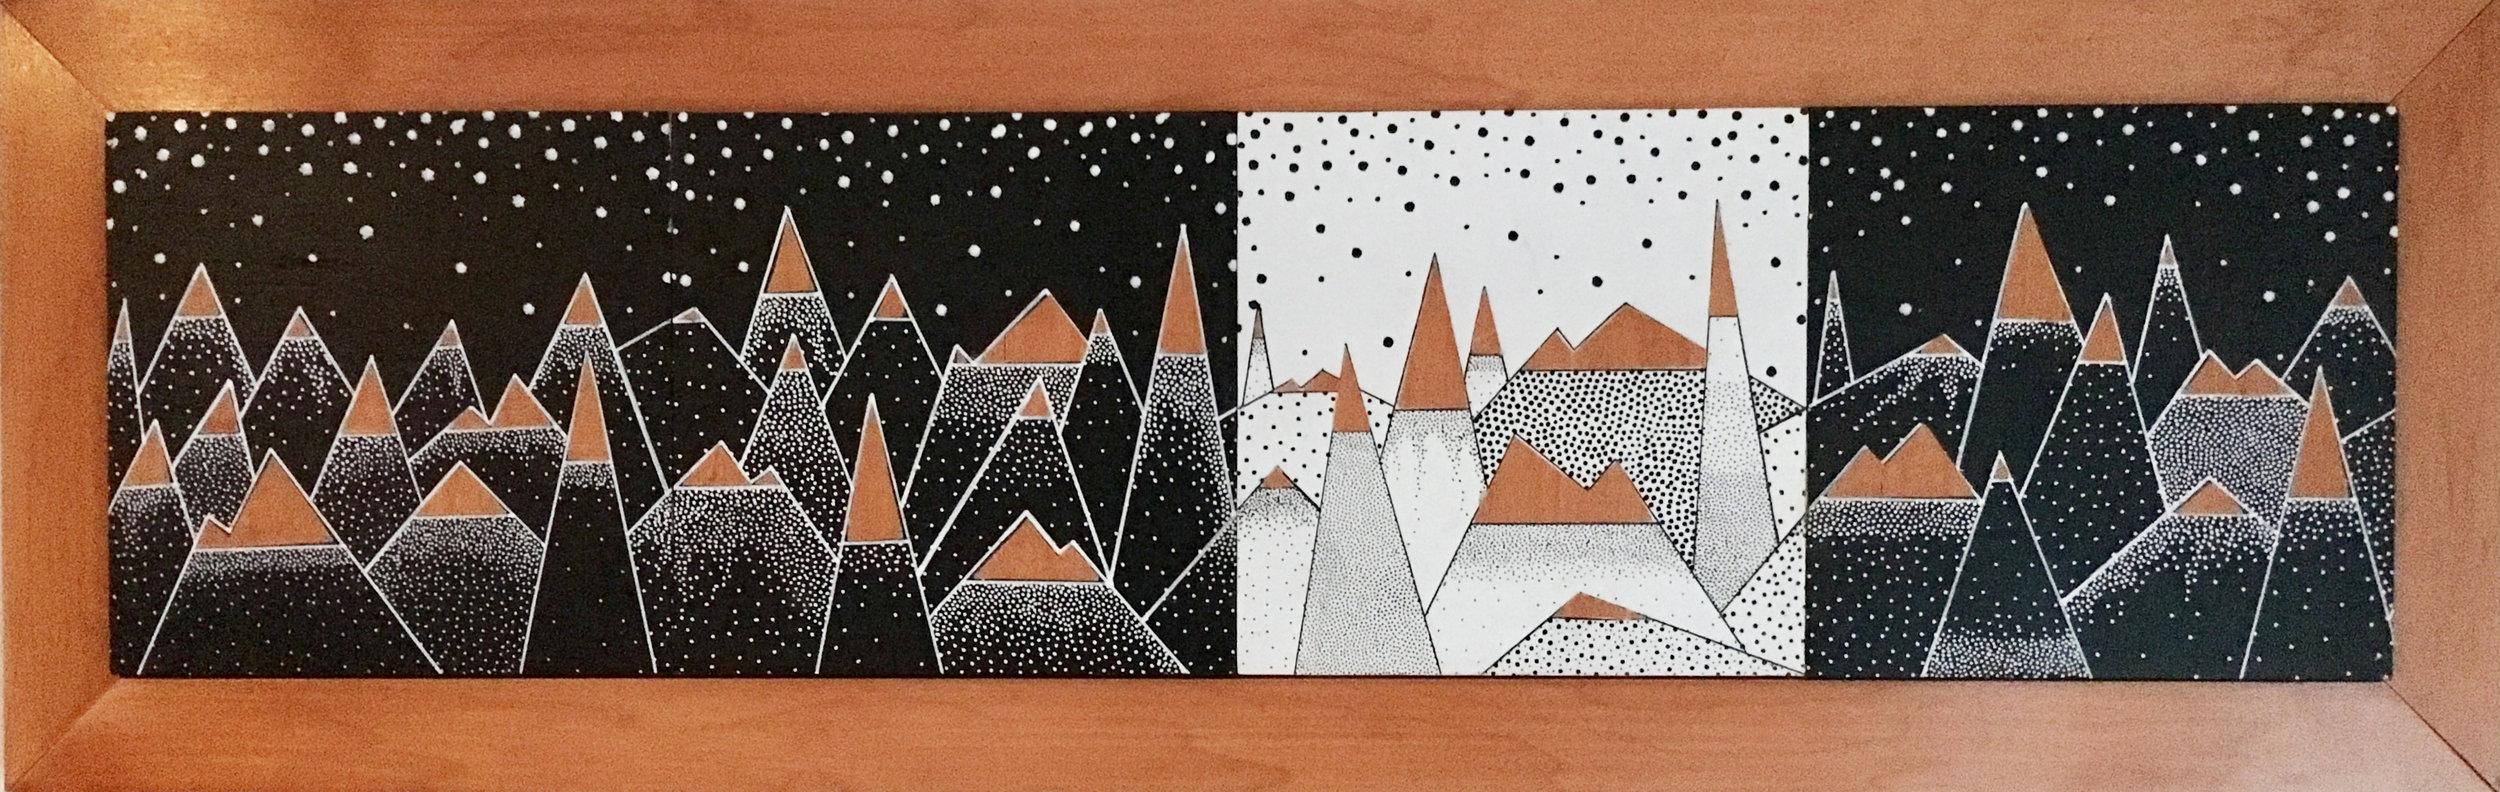 "Snowy Mountains Series 2015   27"" x 8.5"" x 0.75""  Acrylic and Veneer on Wood"